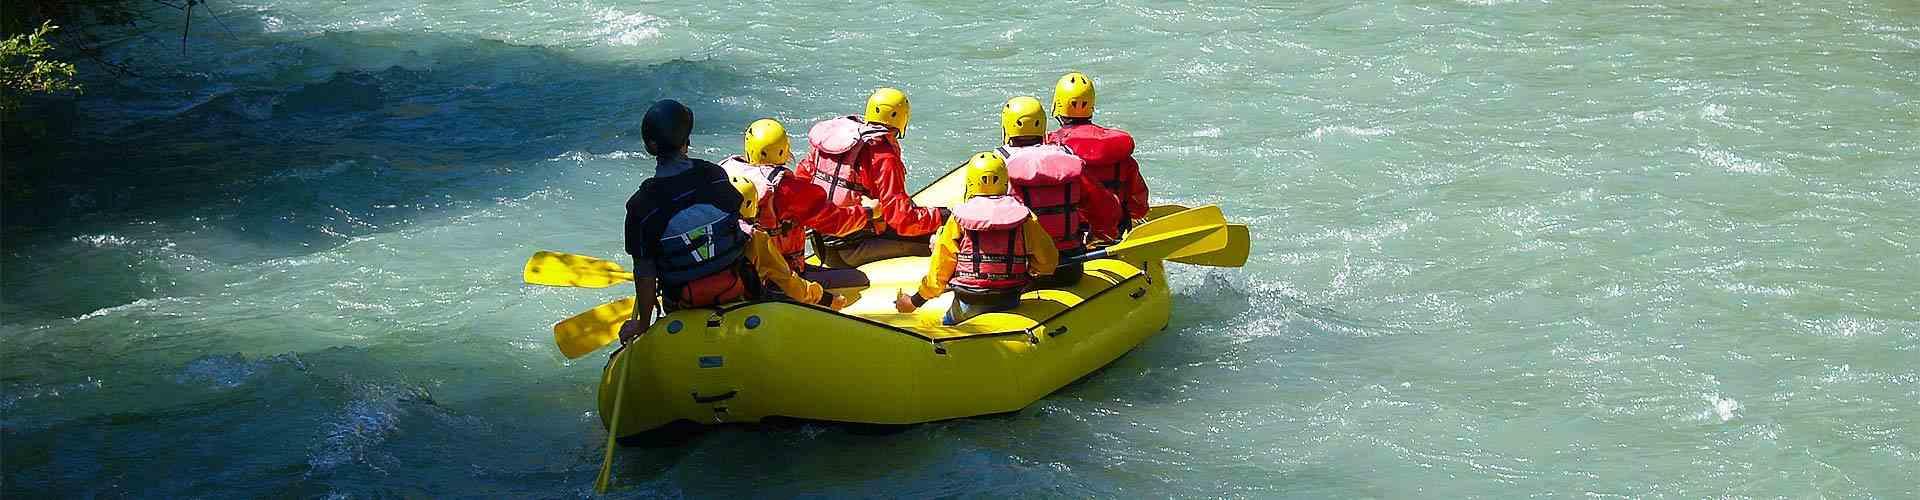 rafting en centrosdeportes de Boi